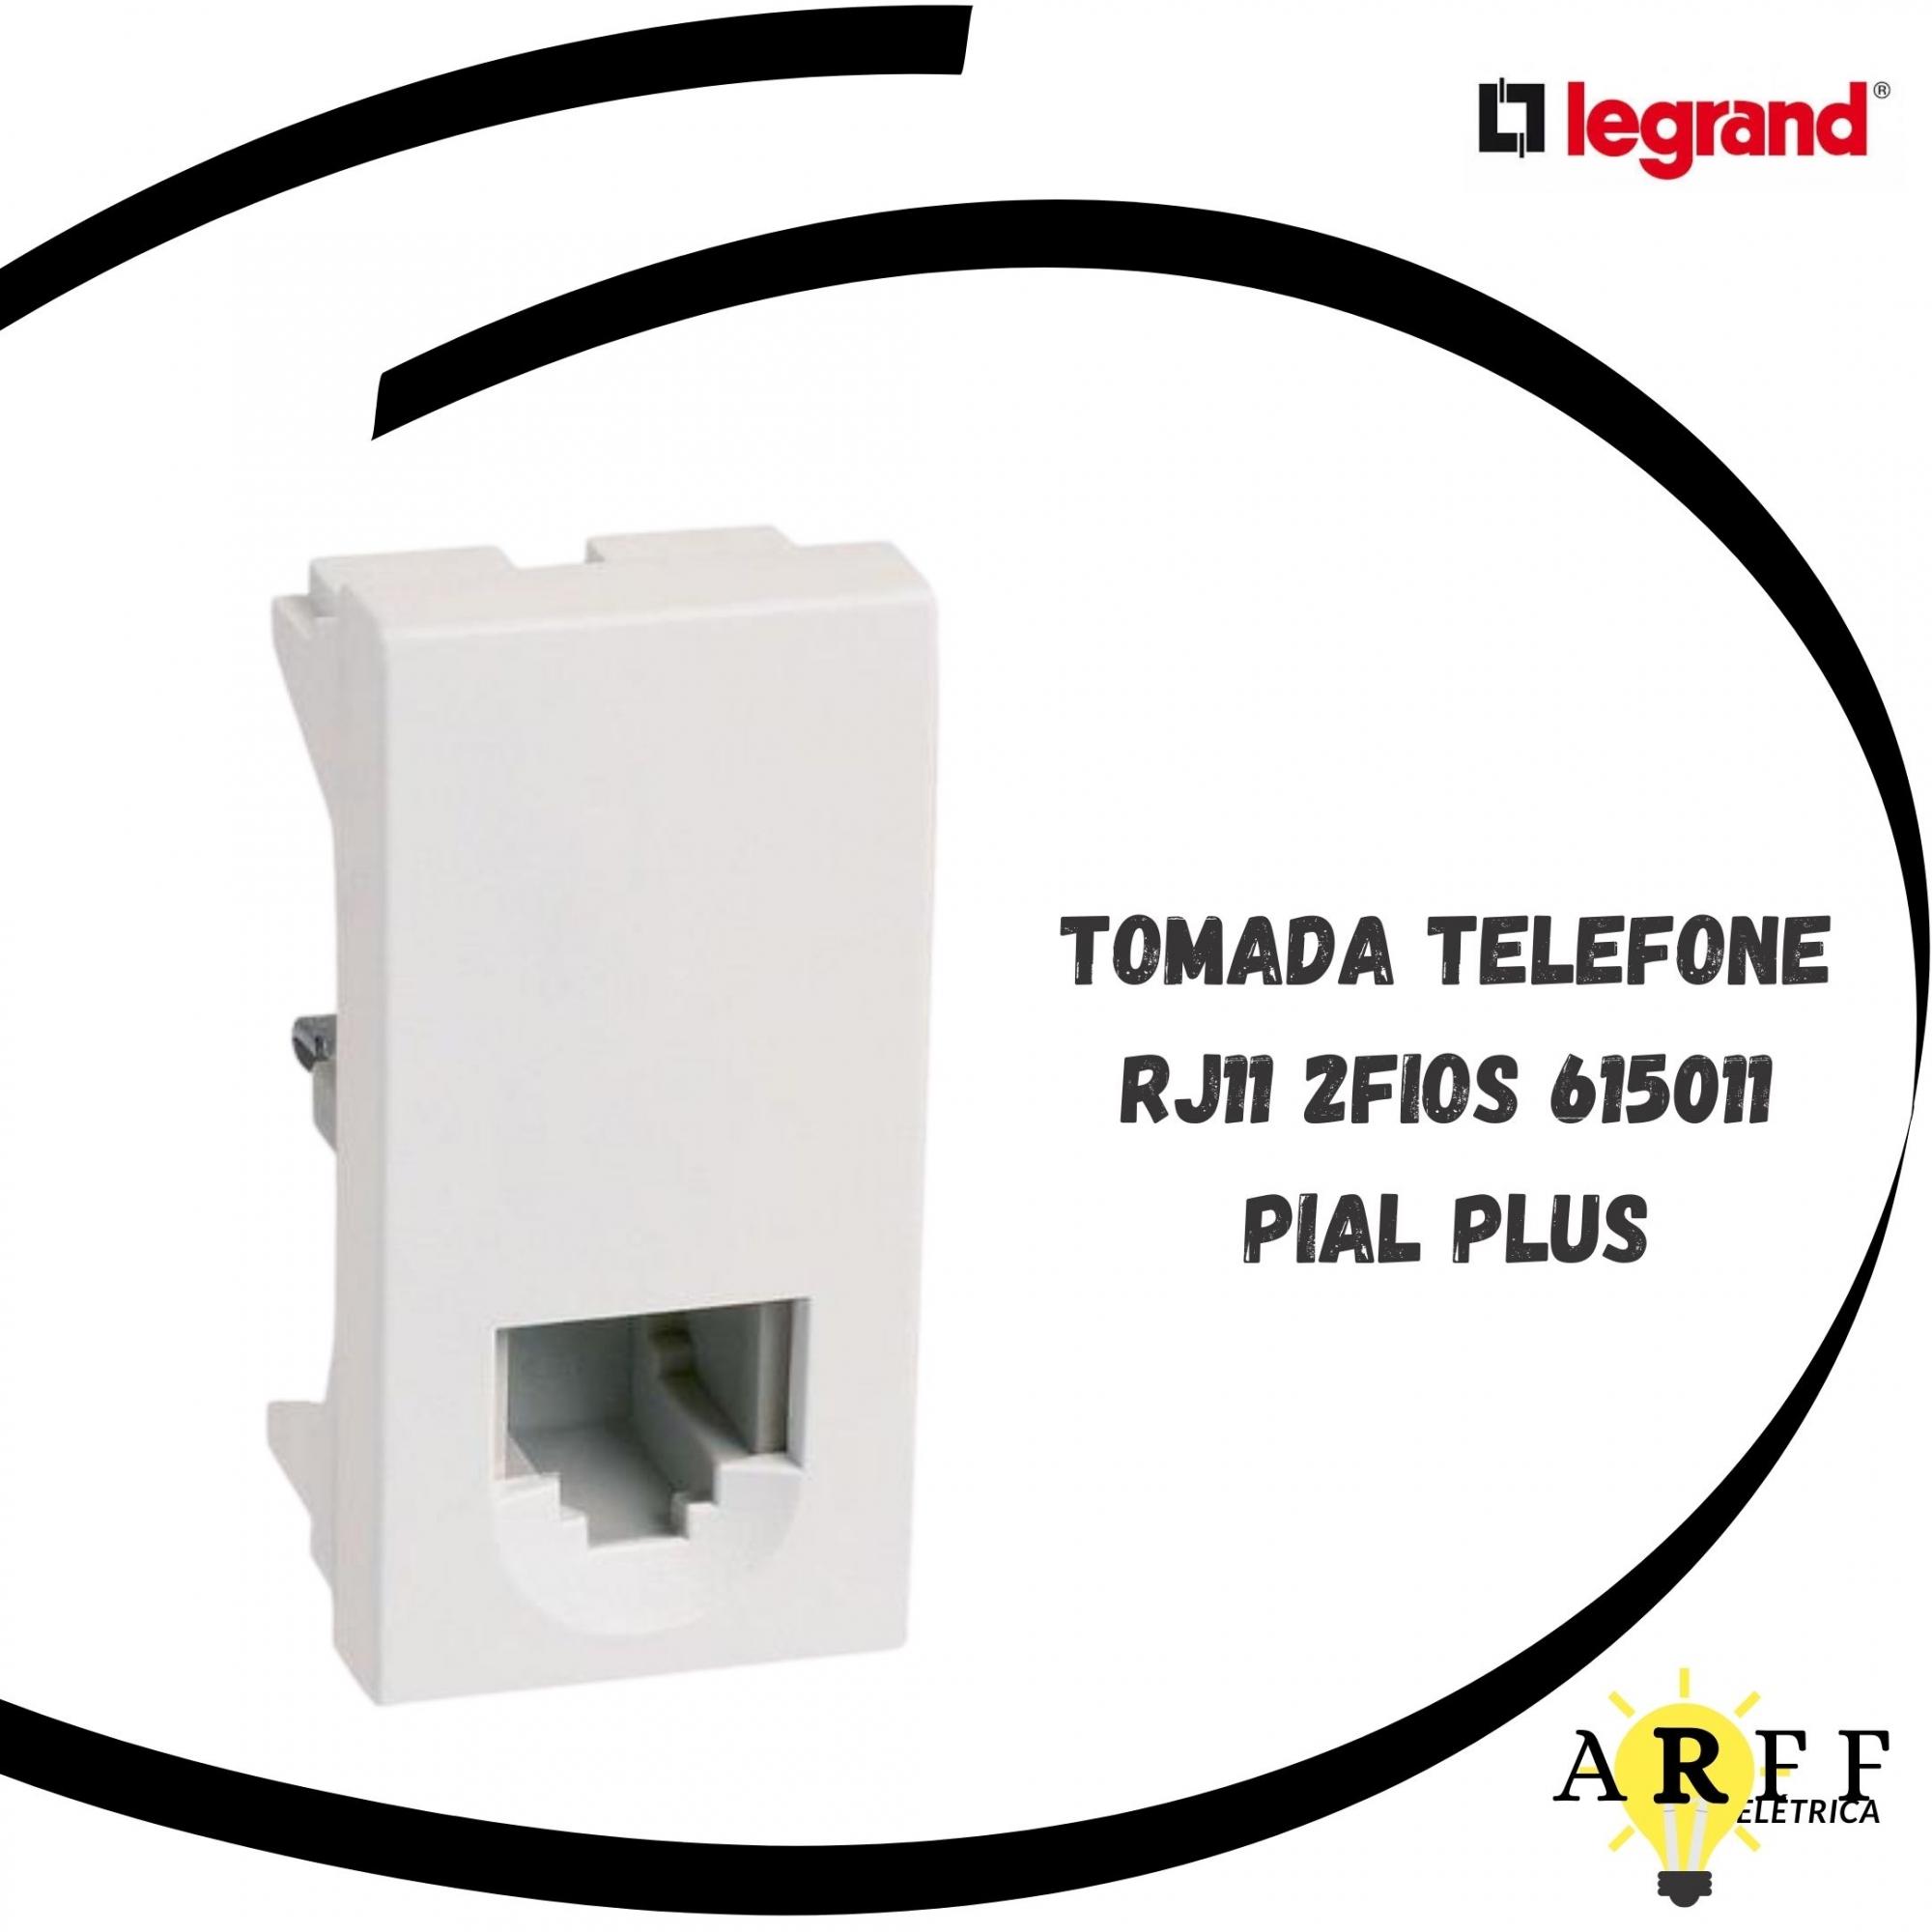 615011 Tomada Telefone RJ11 2FIOS PIAL PLUS LEGRAND